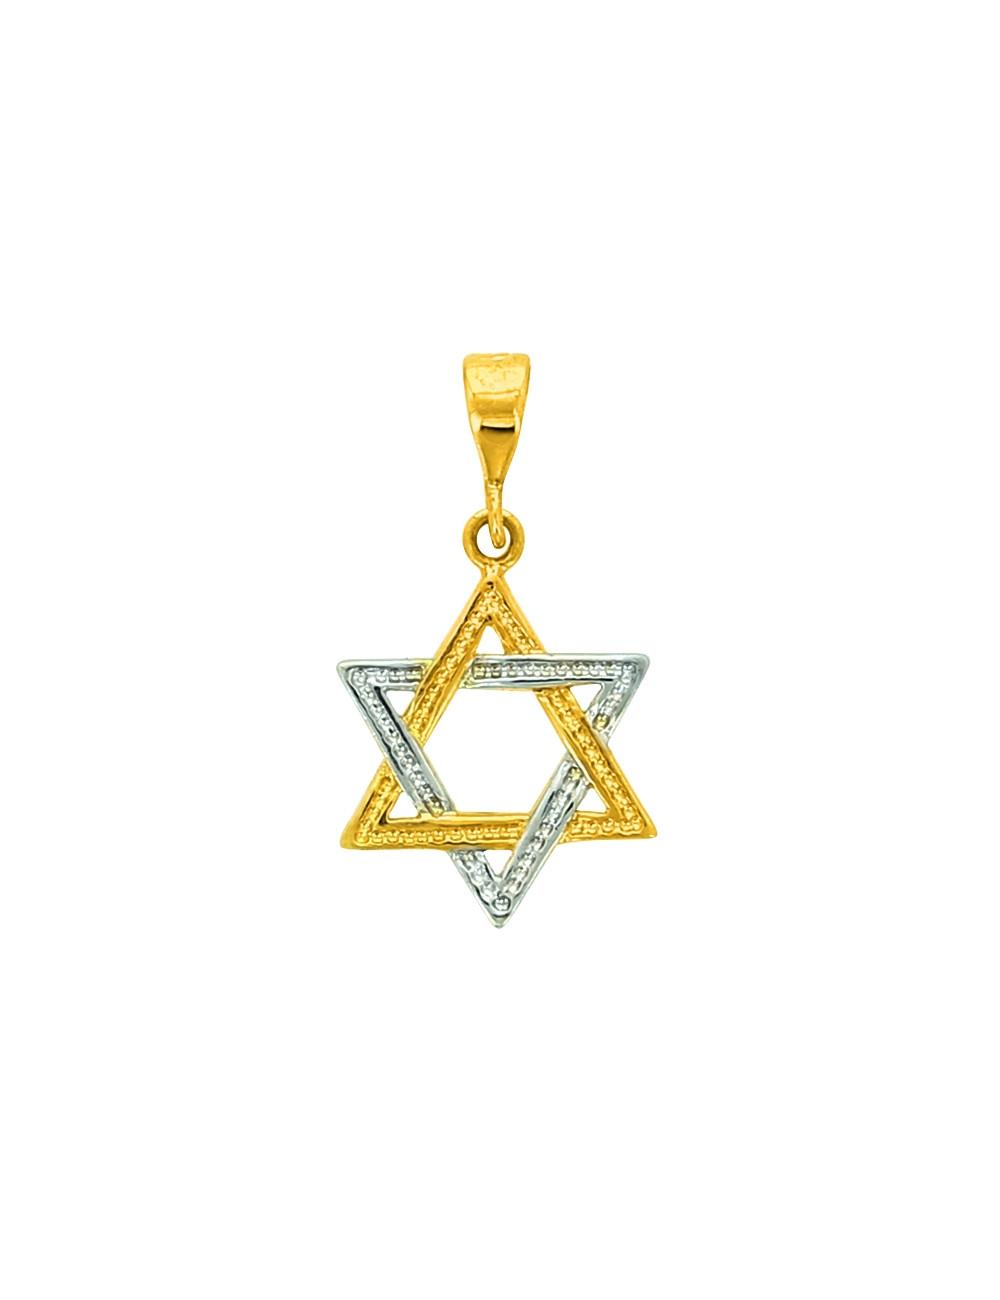 Pendentif Etoile de David 2 Ors 18 Carats + Chaine Or Jaune OFFERTE